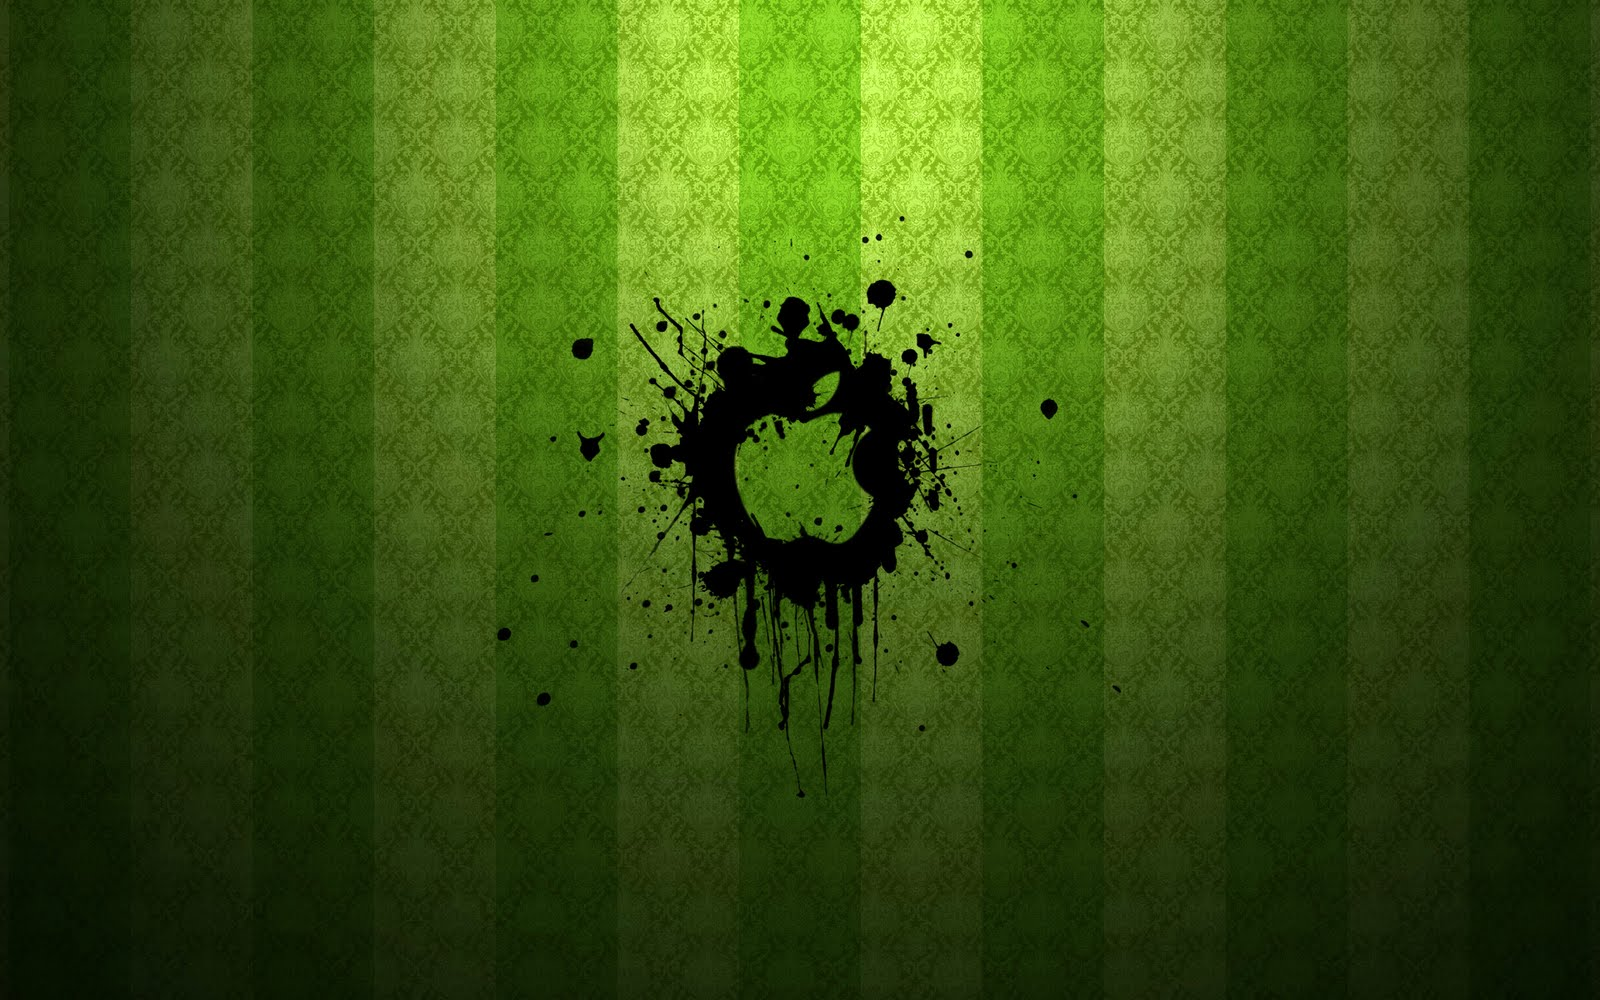 http://4.bp.blogspot.com/-f1Fo4CasxXo/TbLRq2EuFQI/AAAAAAAAA0Y/A5P4FxNsg68/s1600/splash-apple-logo-wallpaper.jpg